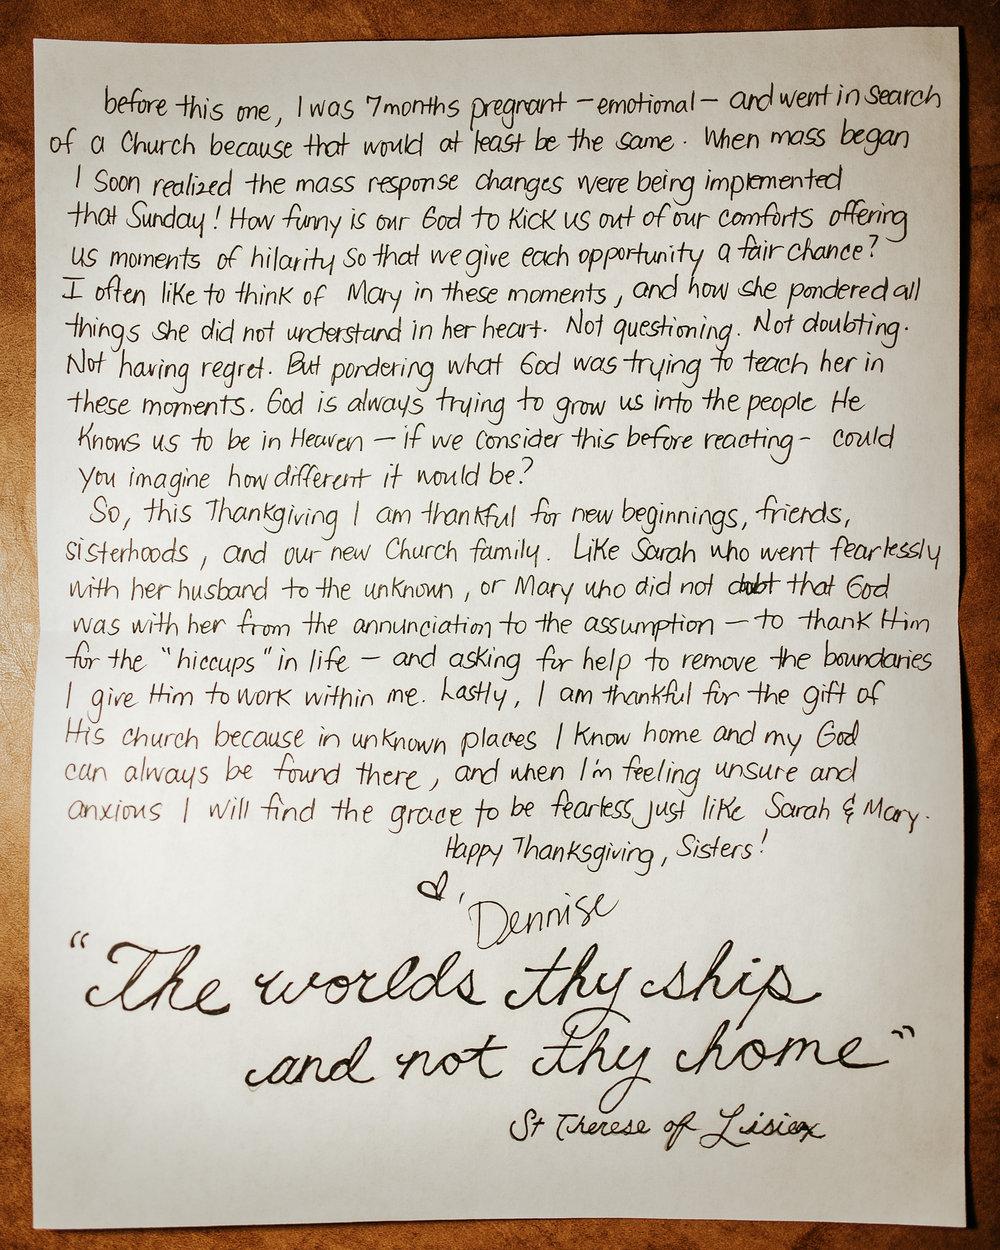 Dennise Santos Letter to Women 2